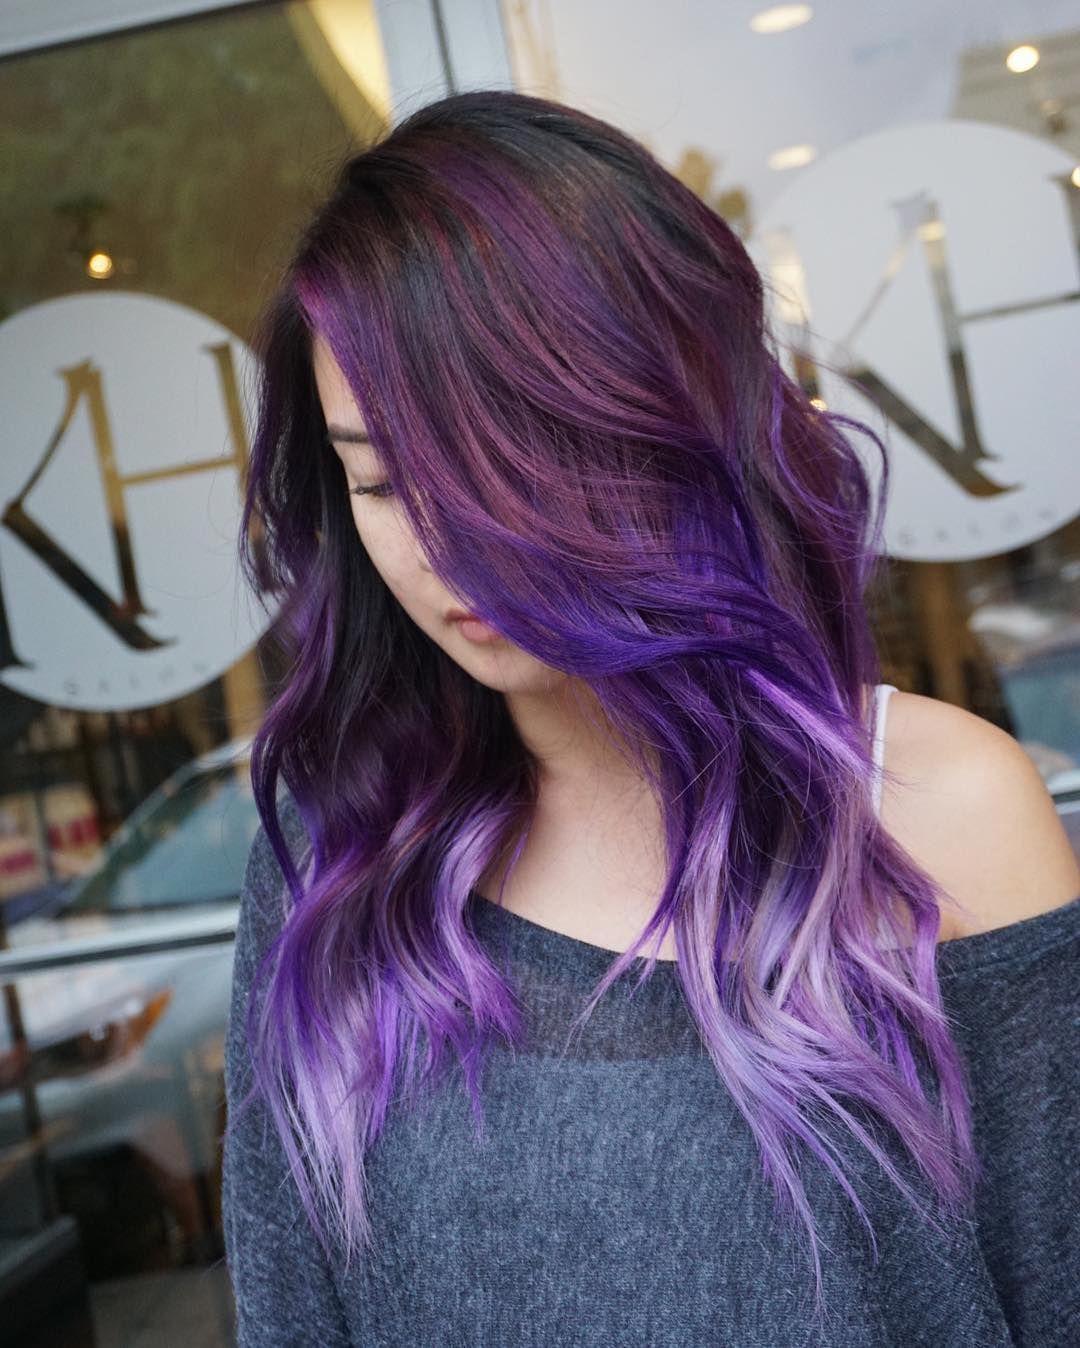 Pin By Jilly Burnham On Hair Inspiration Haarfarben Frisuren Farben